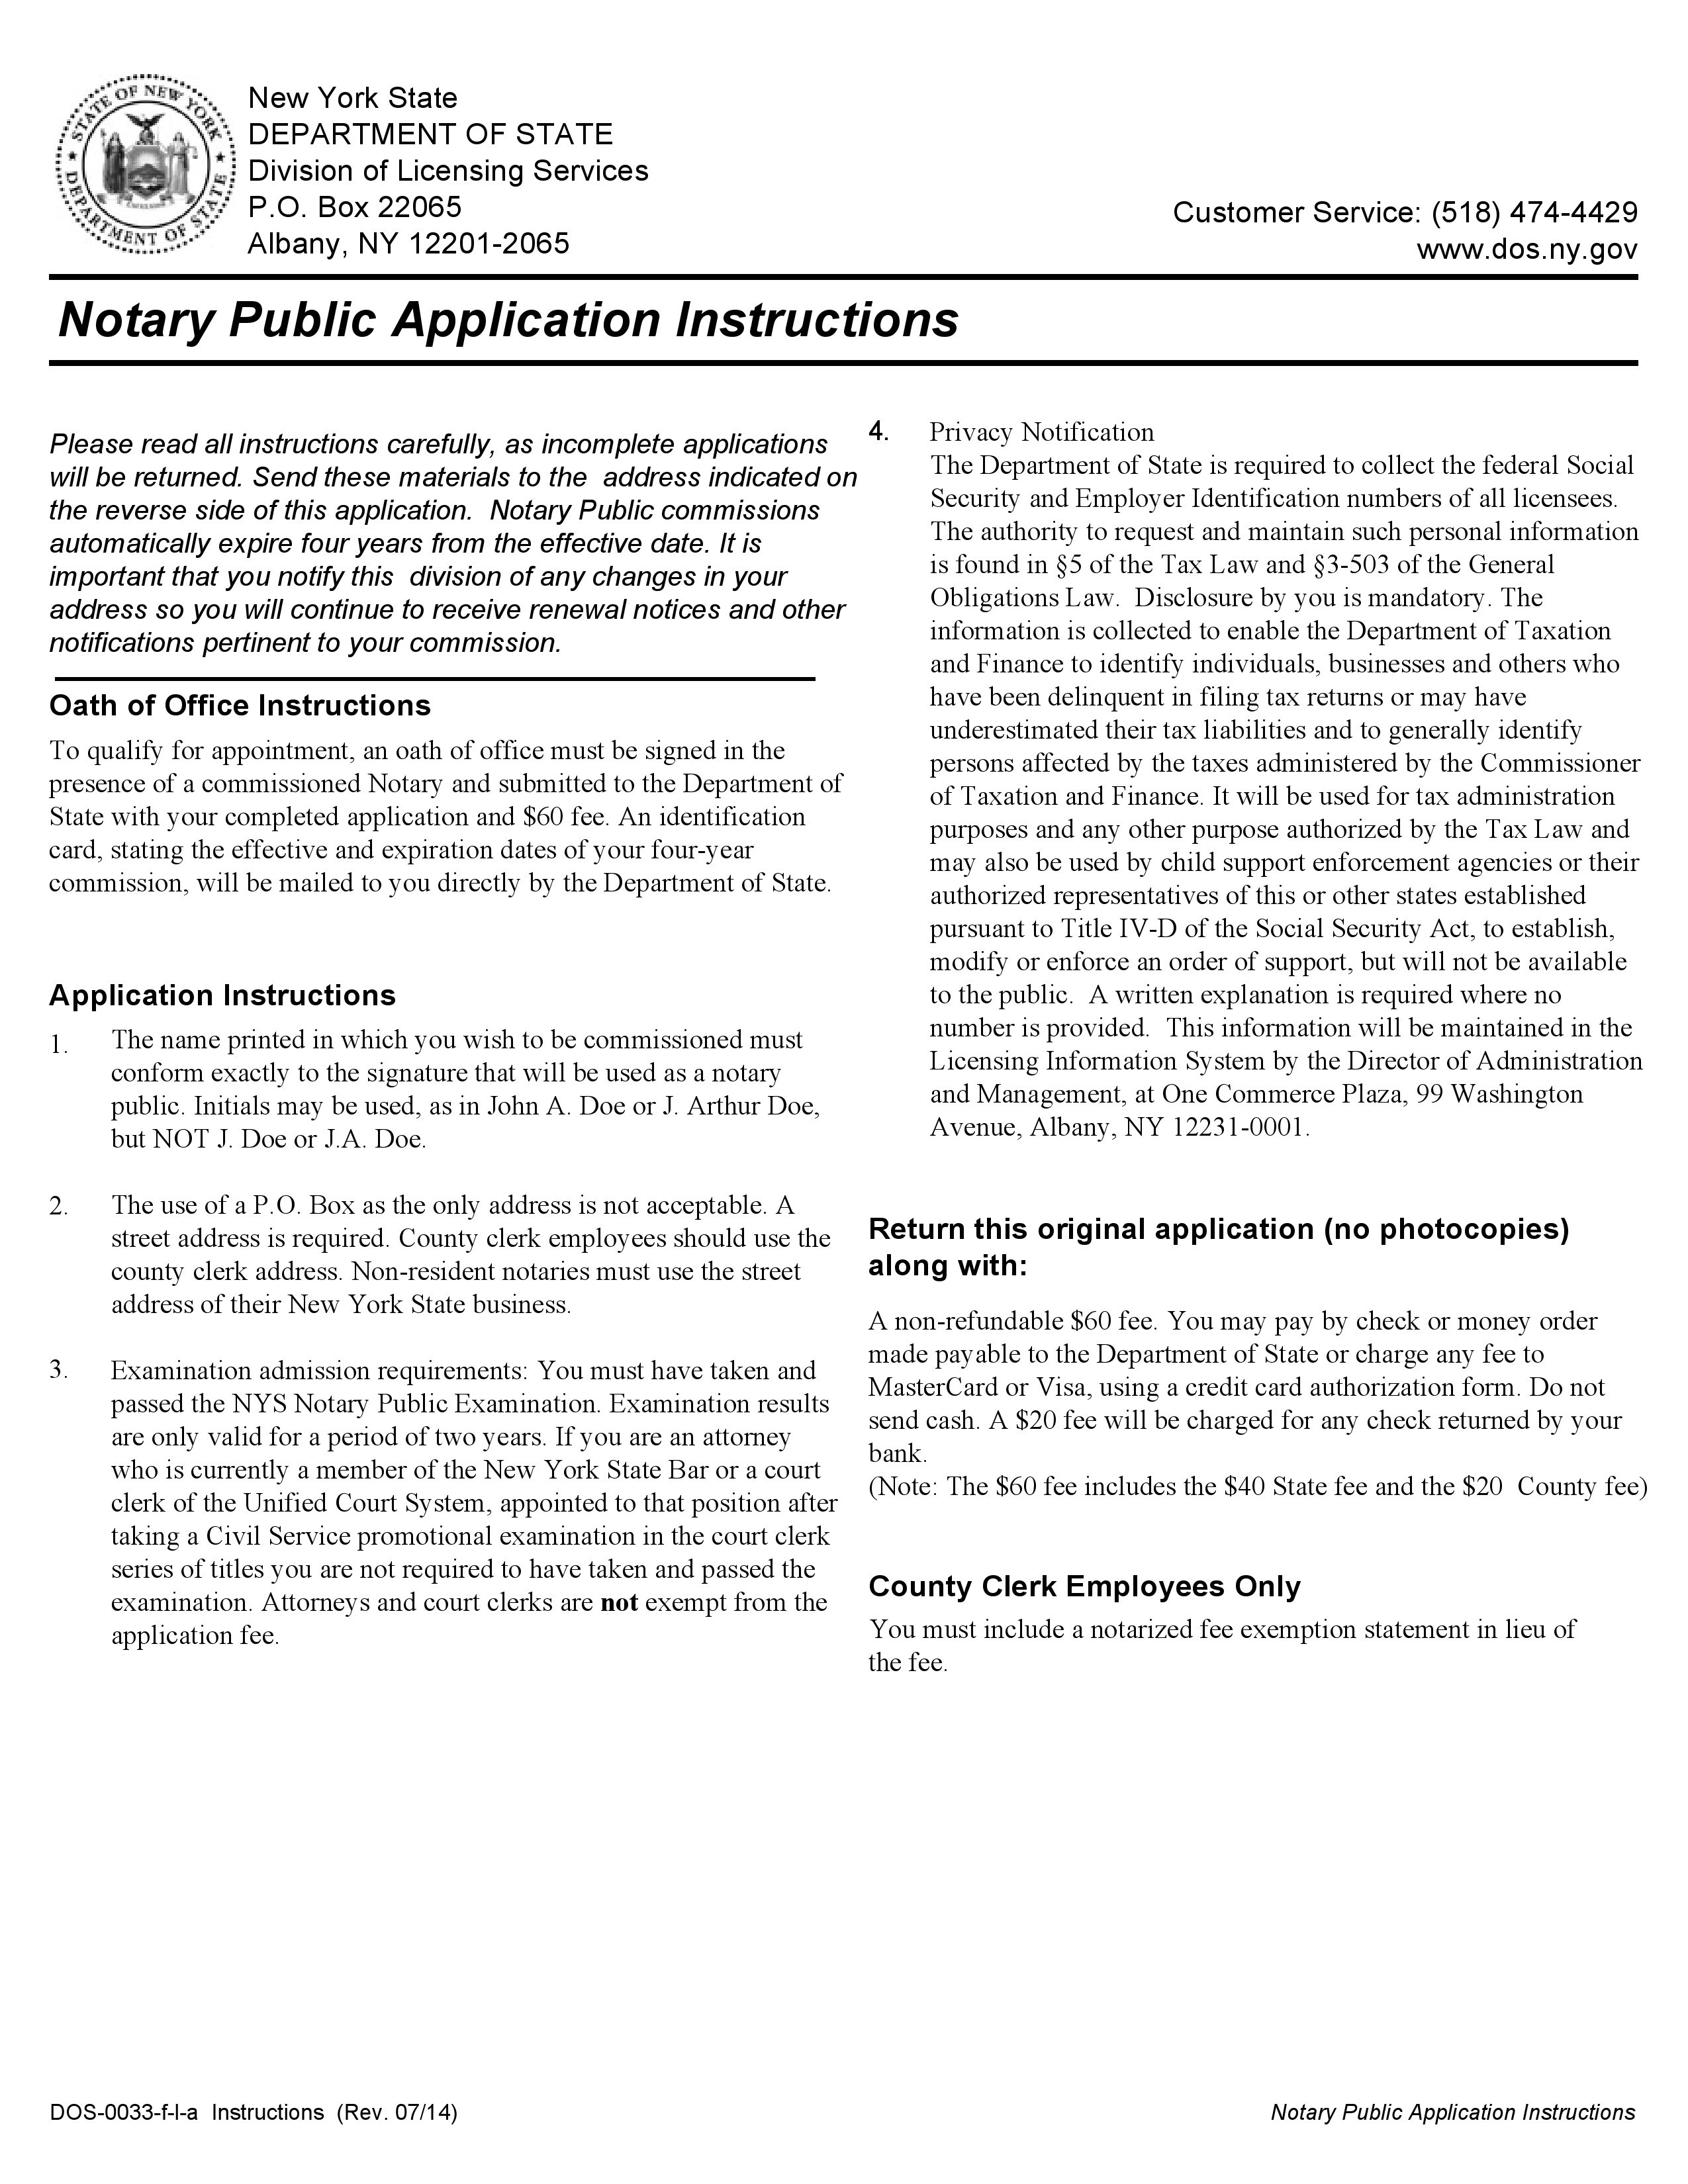 New York Notary Public Application Form – Notary Public Near Me